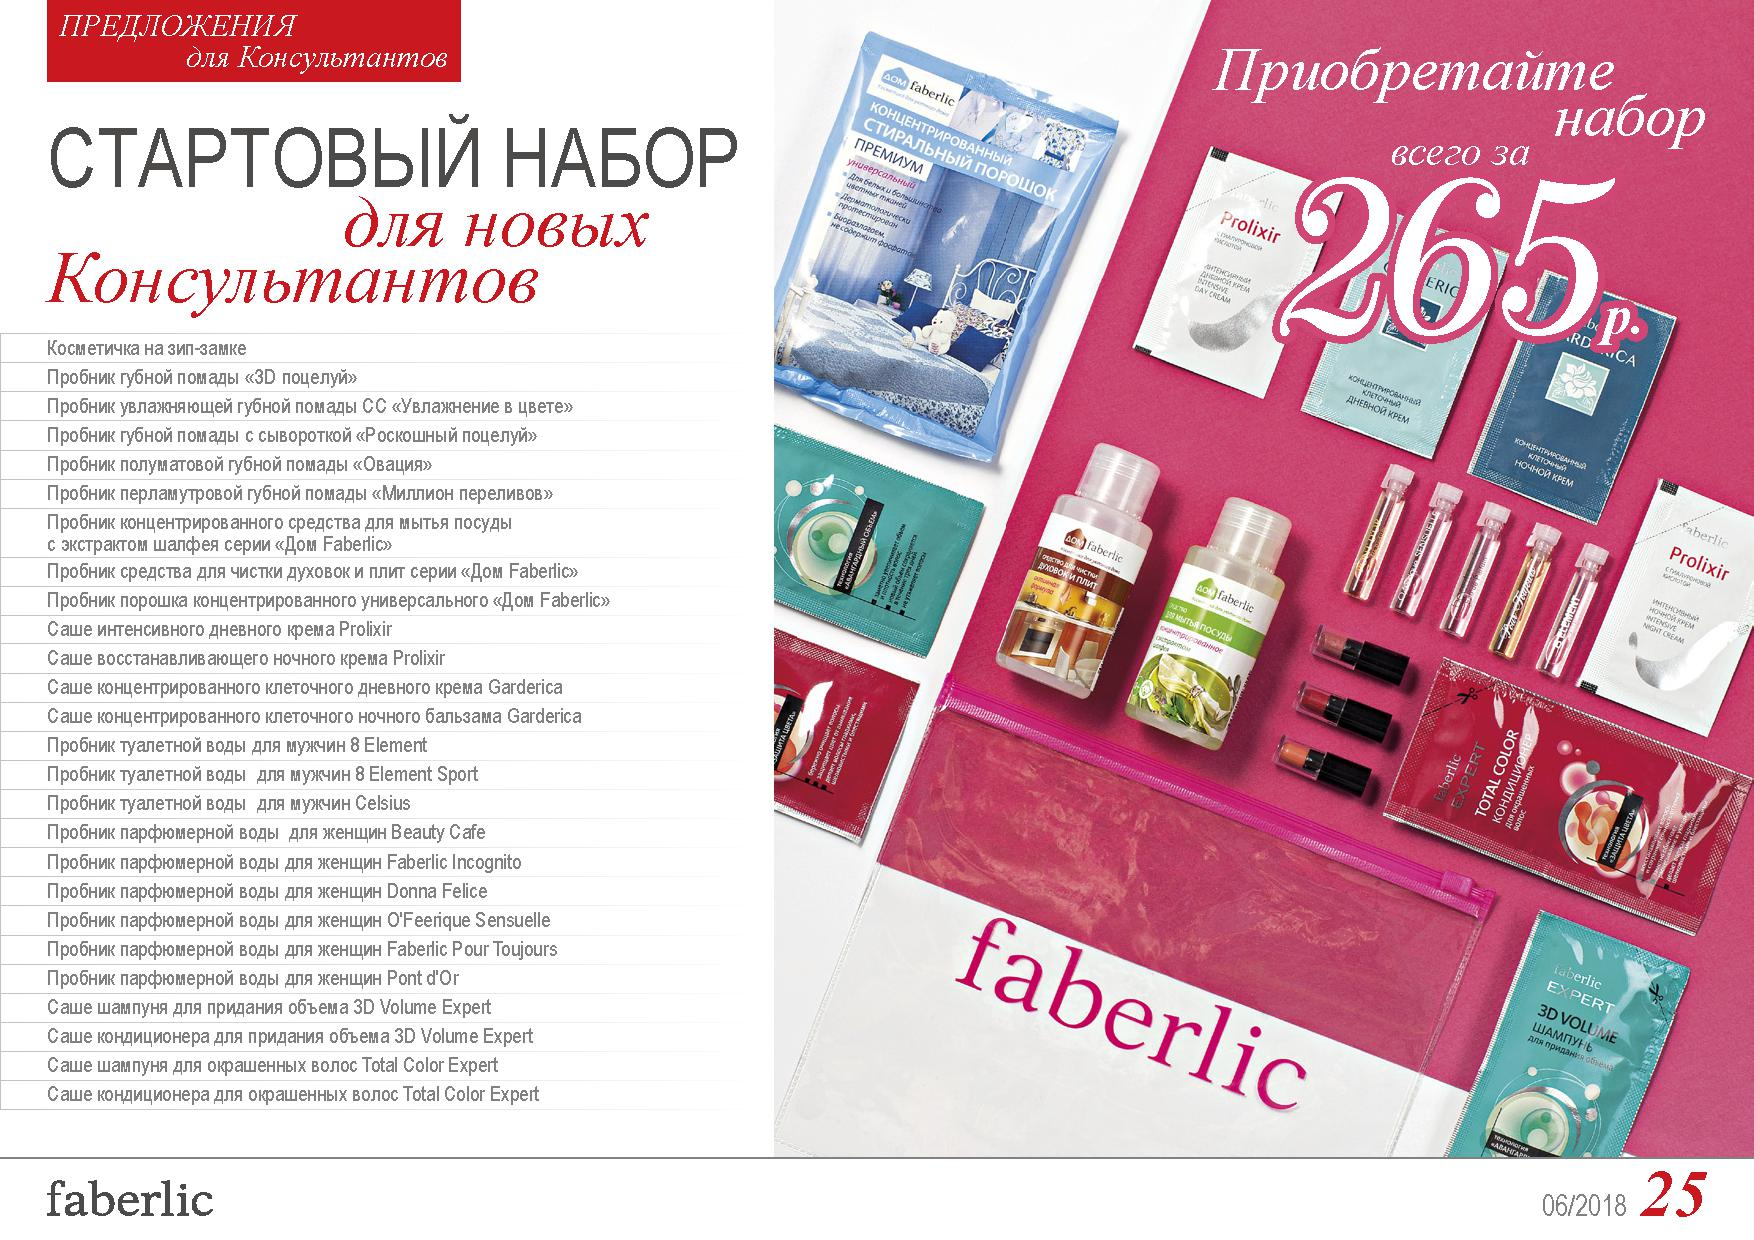 Фаберлик каталог стр. 25